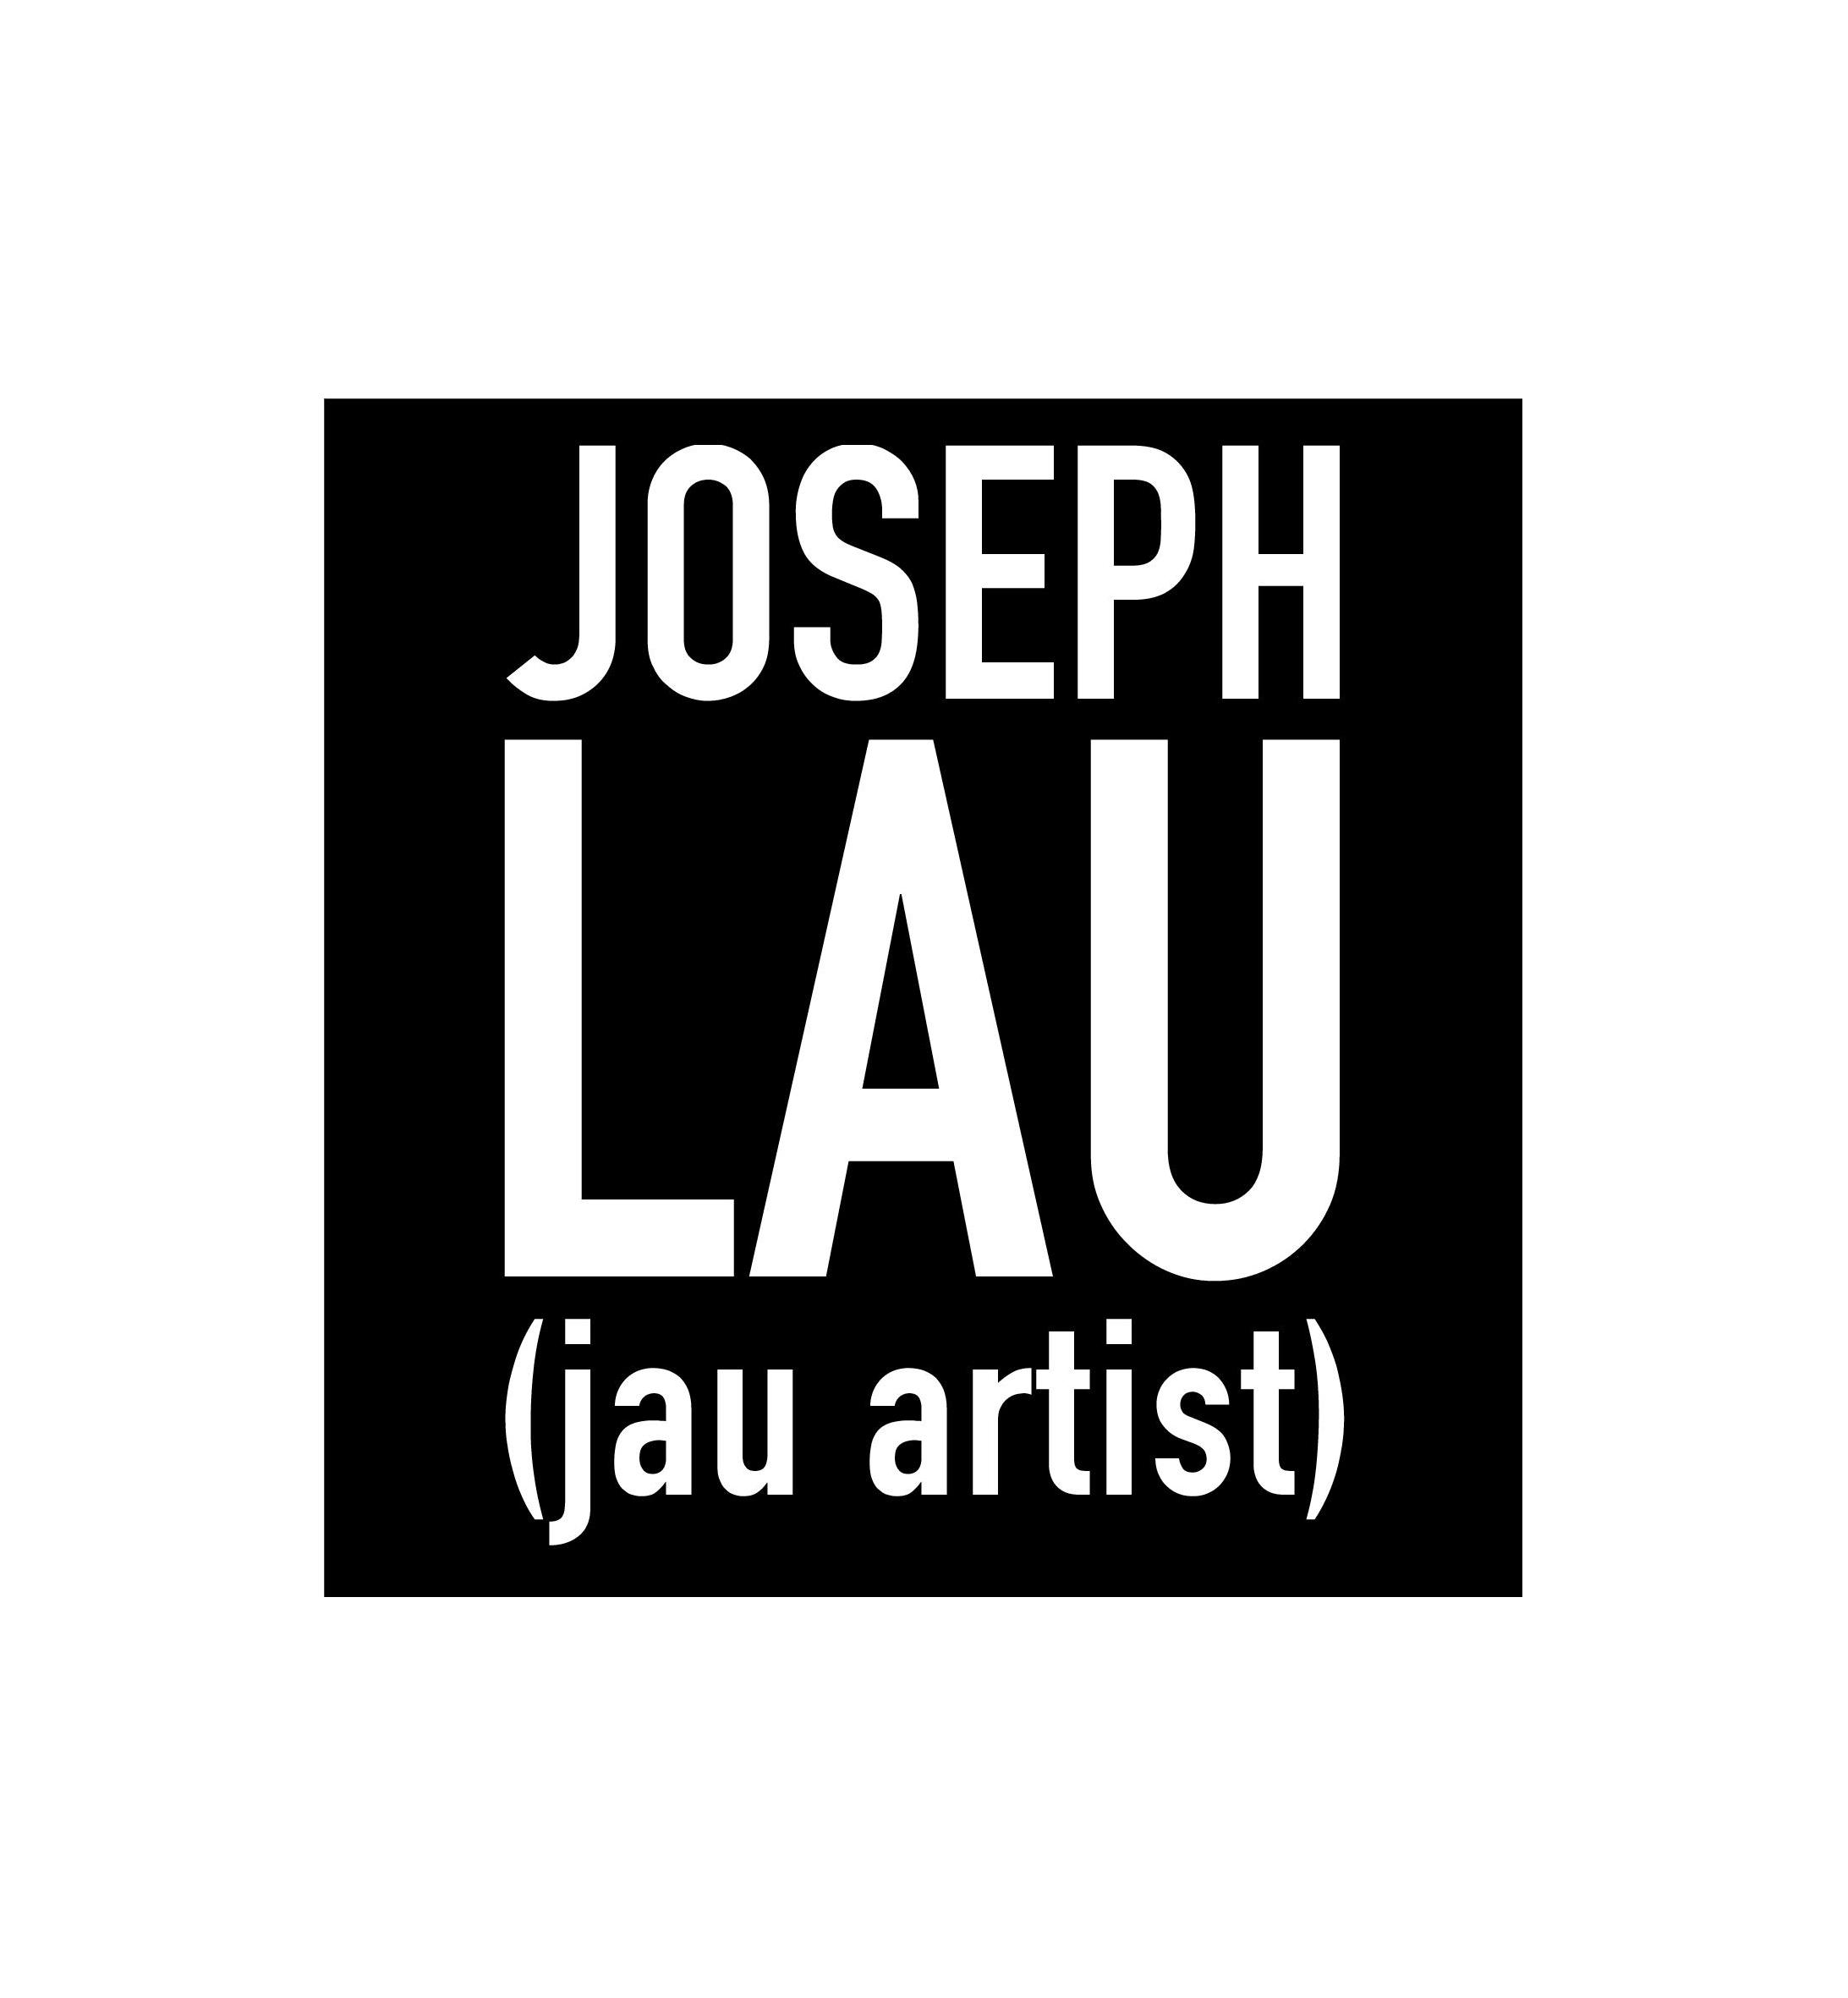 jauartist_square_white_on_black_logo_16Aug2019-01